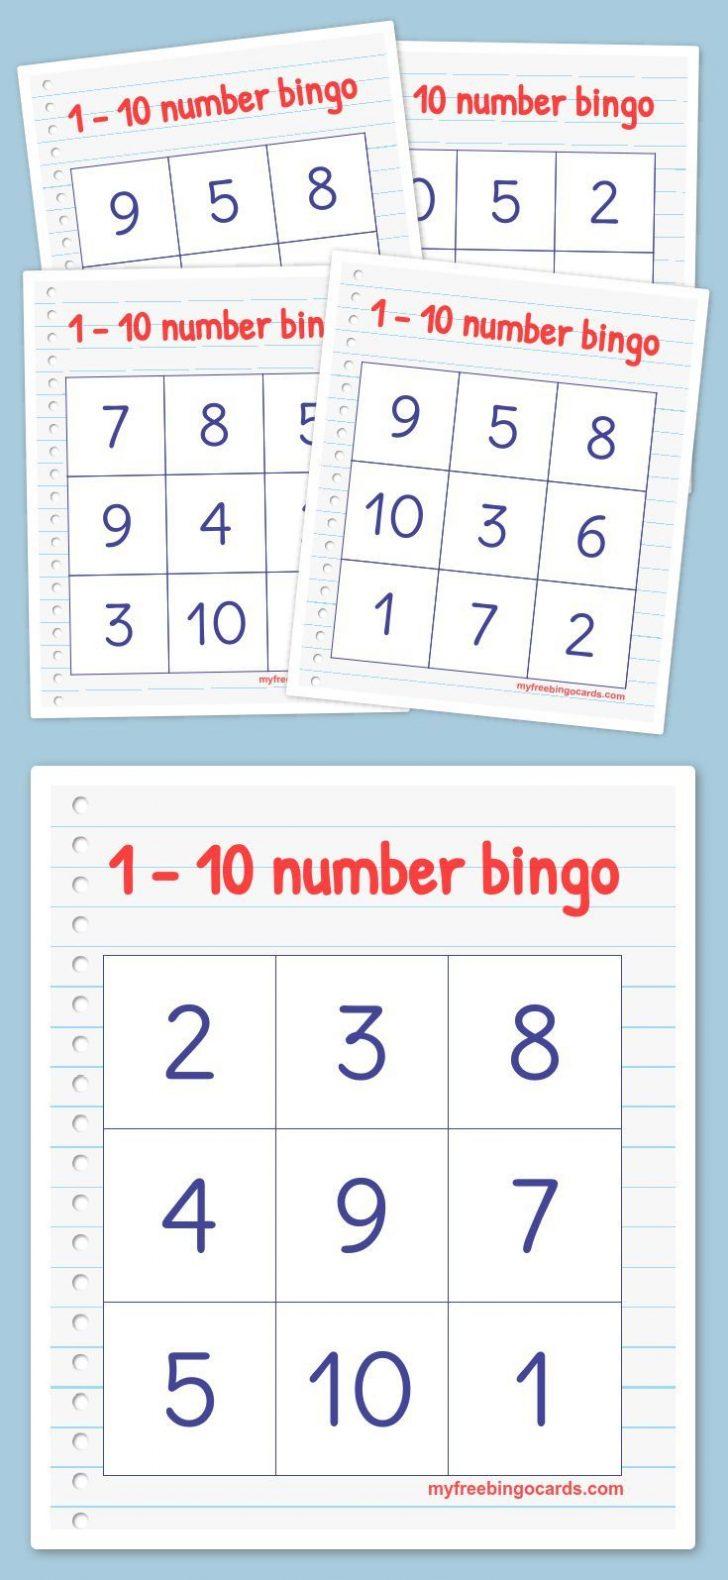 1-20 Bingo Cards Printable